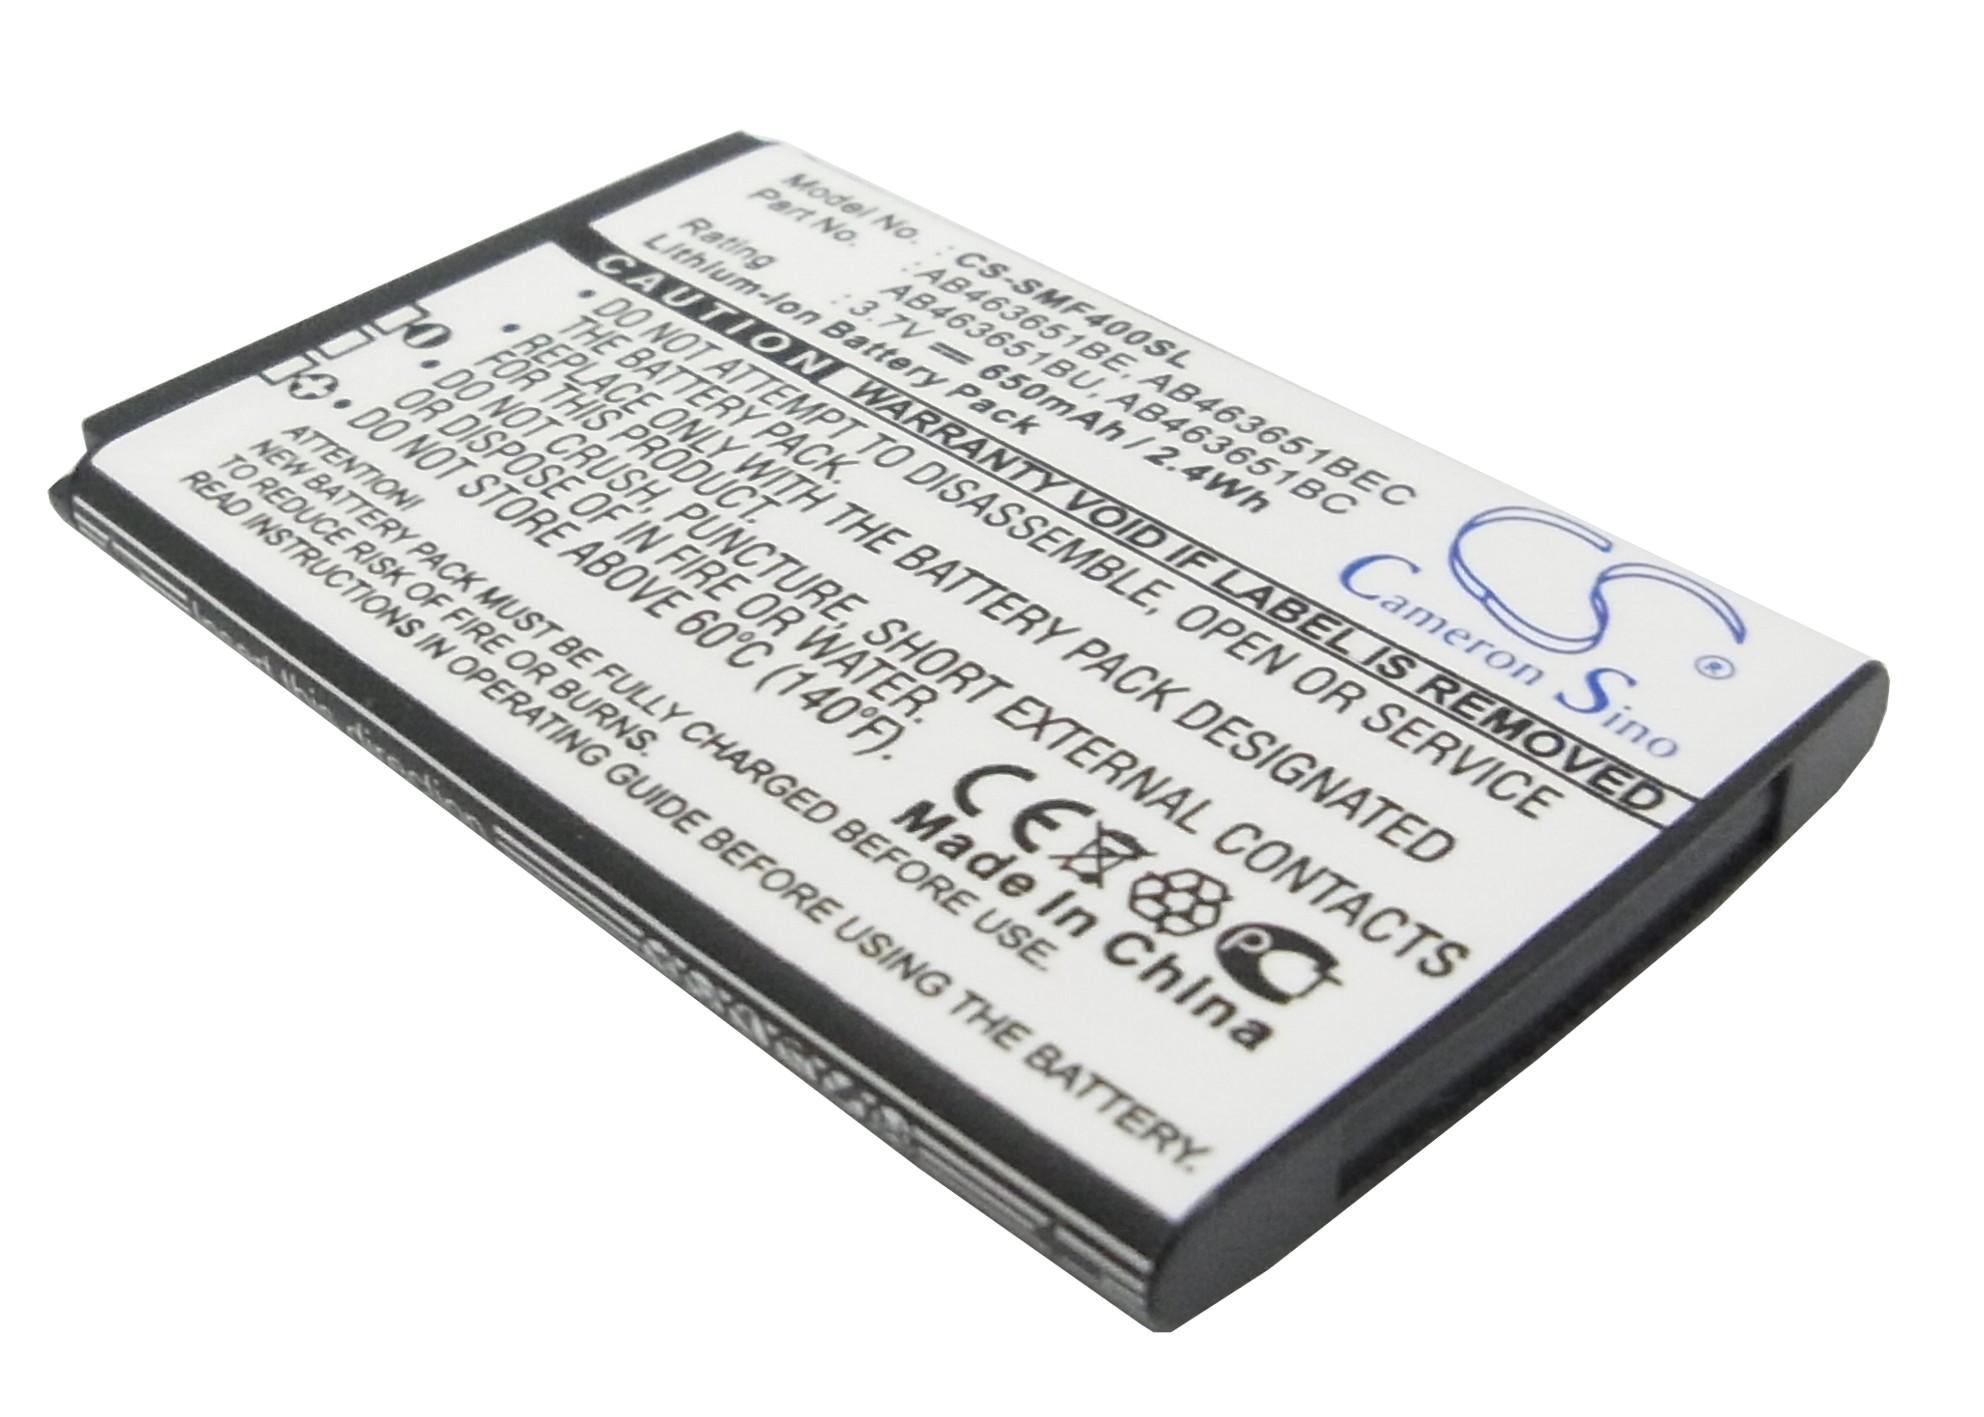 Cameron Sino baterie do mobilů pro SAMSUNG GT-S7220 Lucido 3.7V Li-ion 650mAh černá - neoriginální